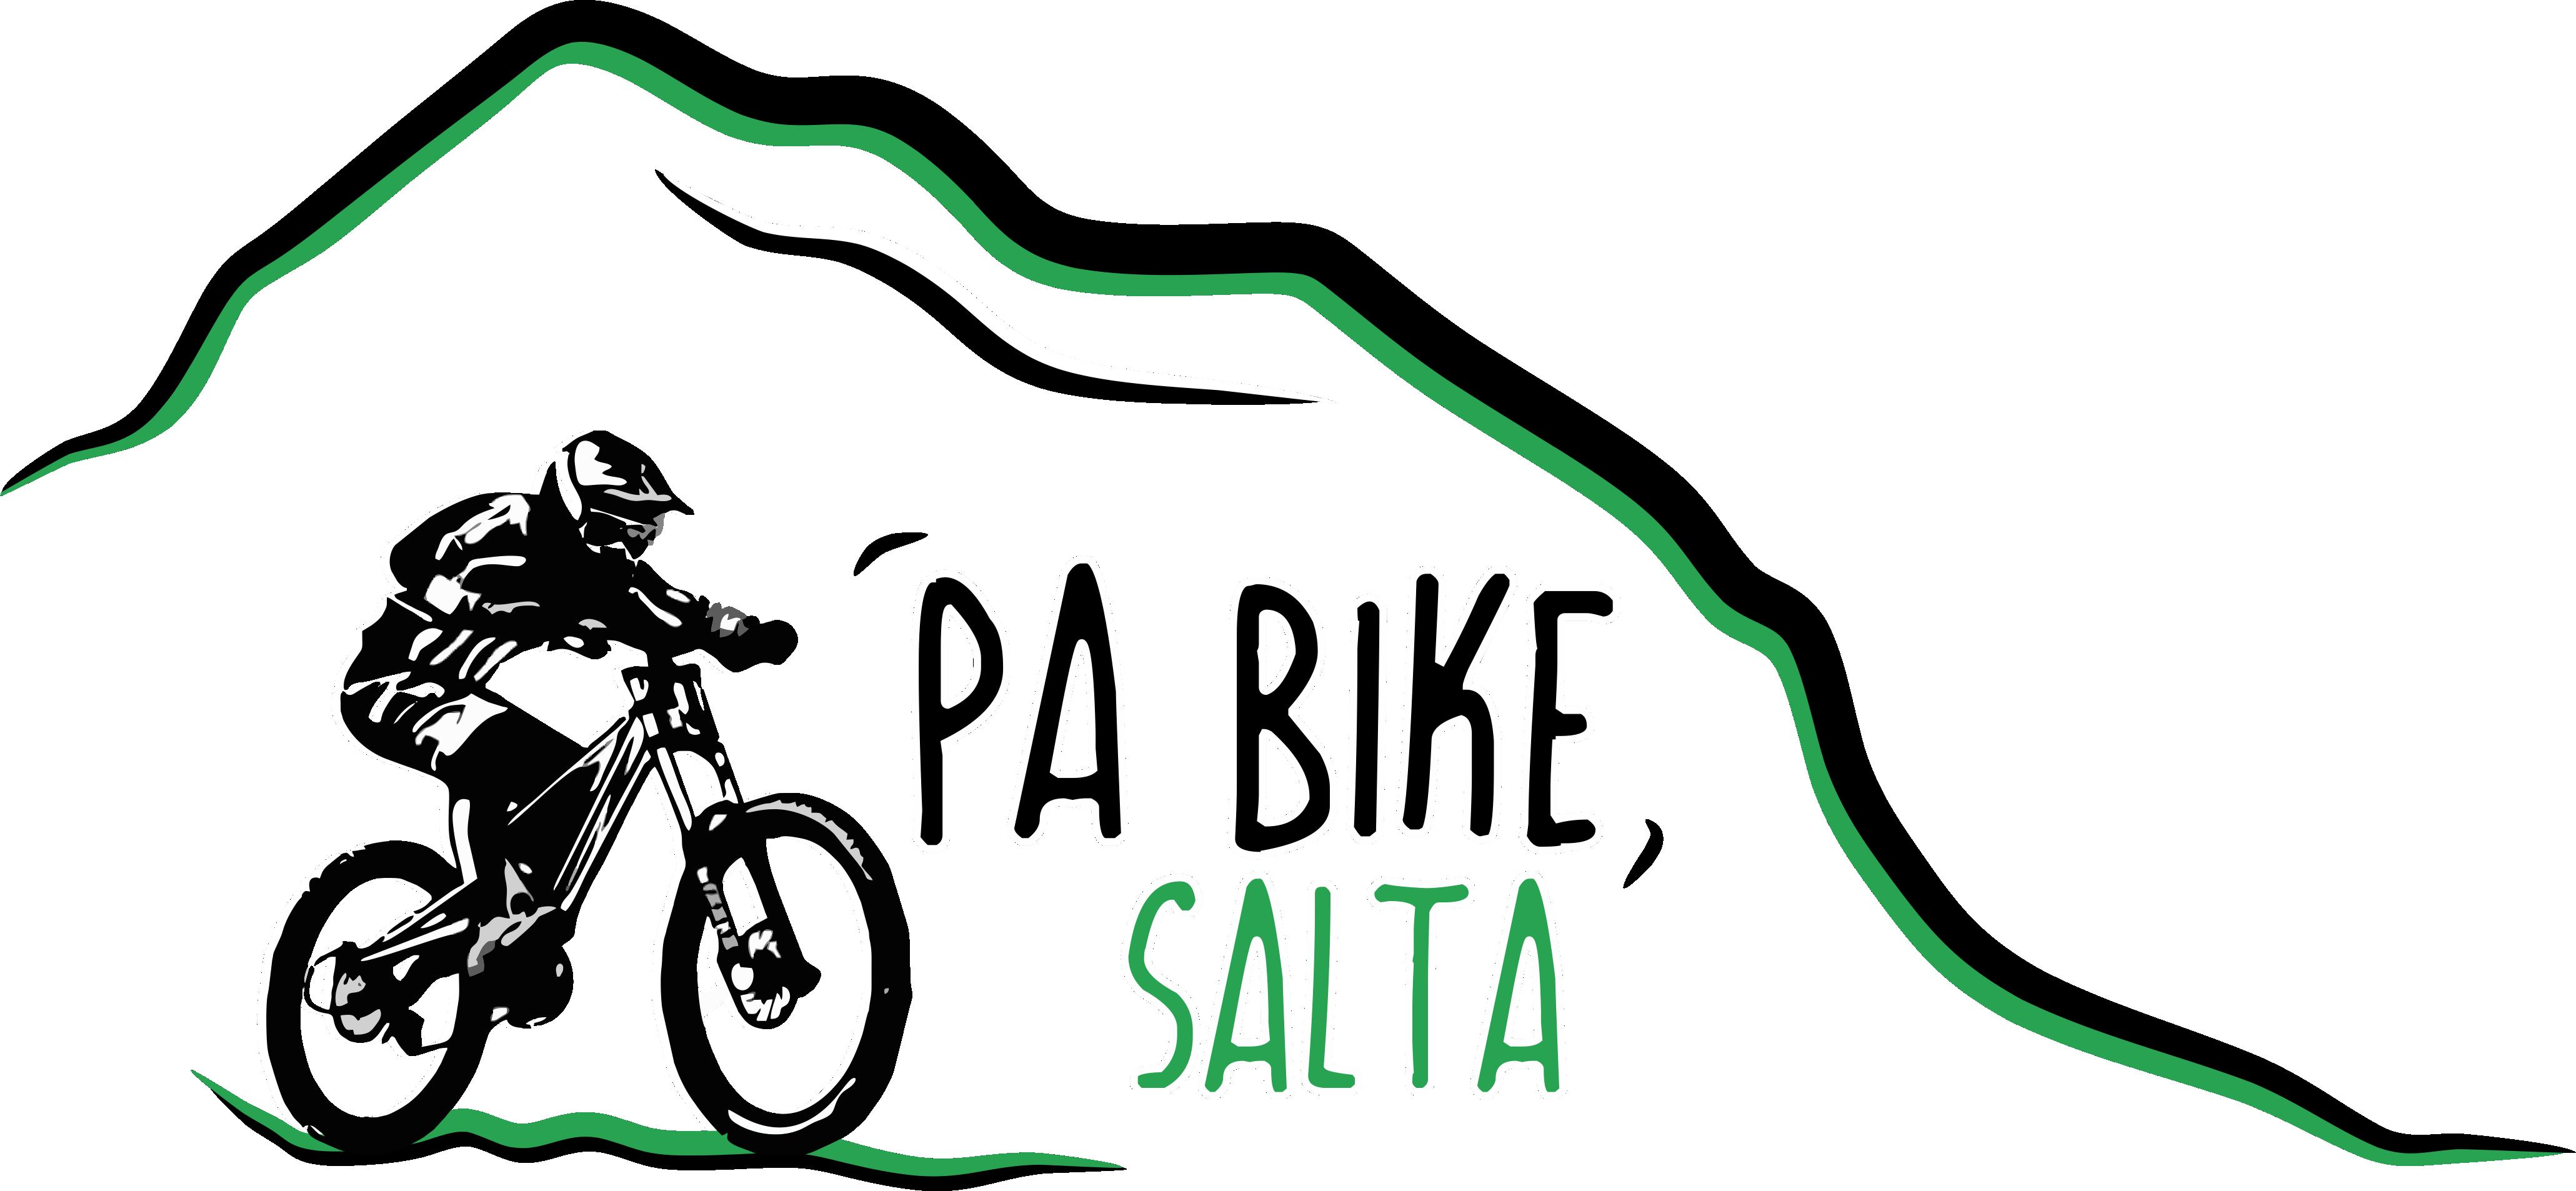 Pa Bike Salta